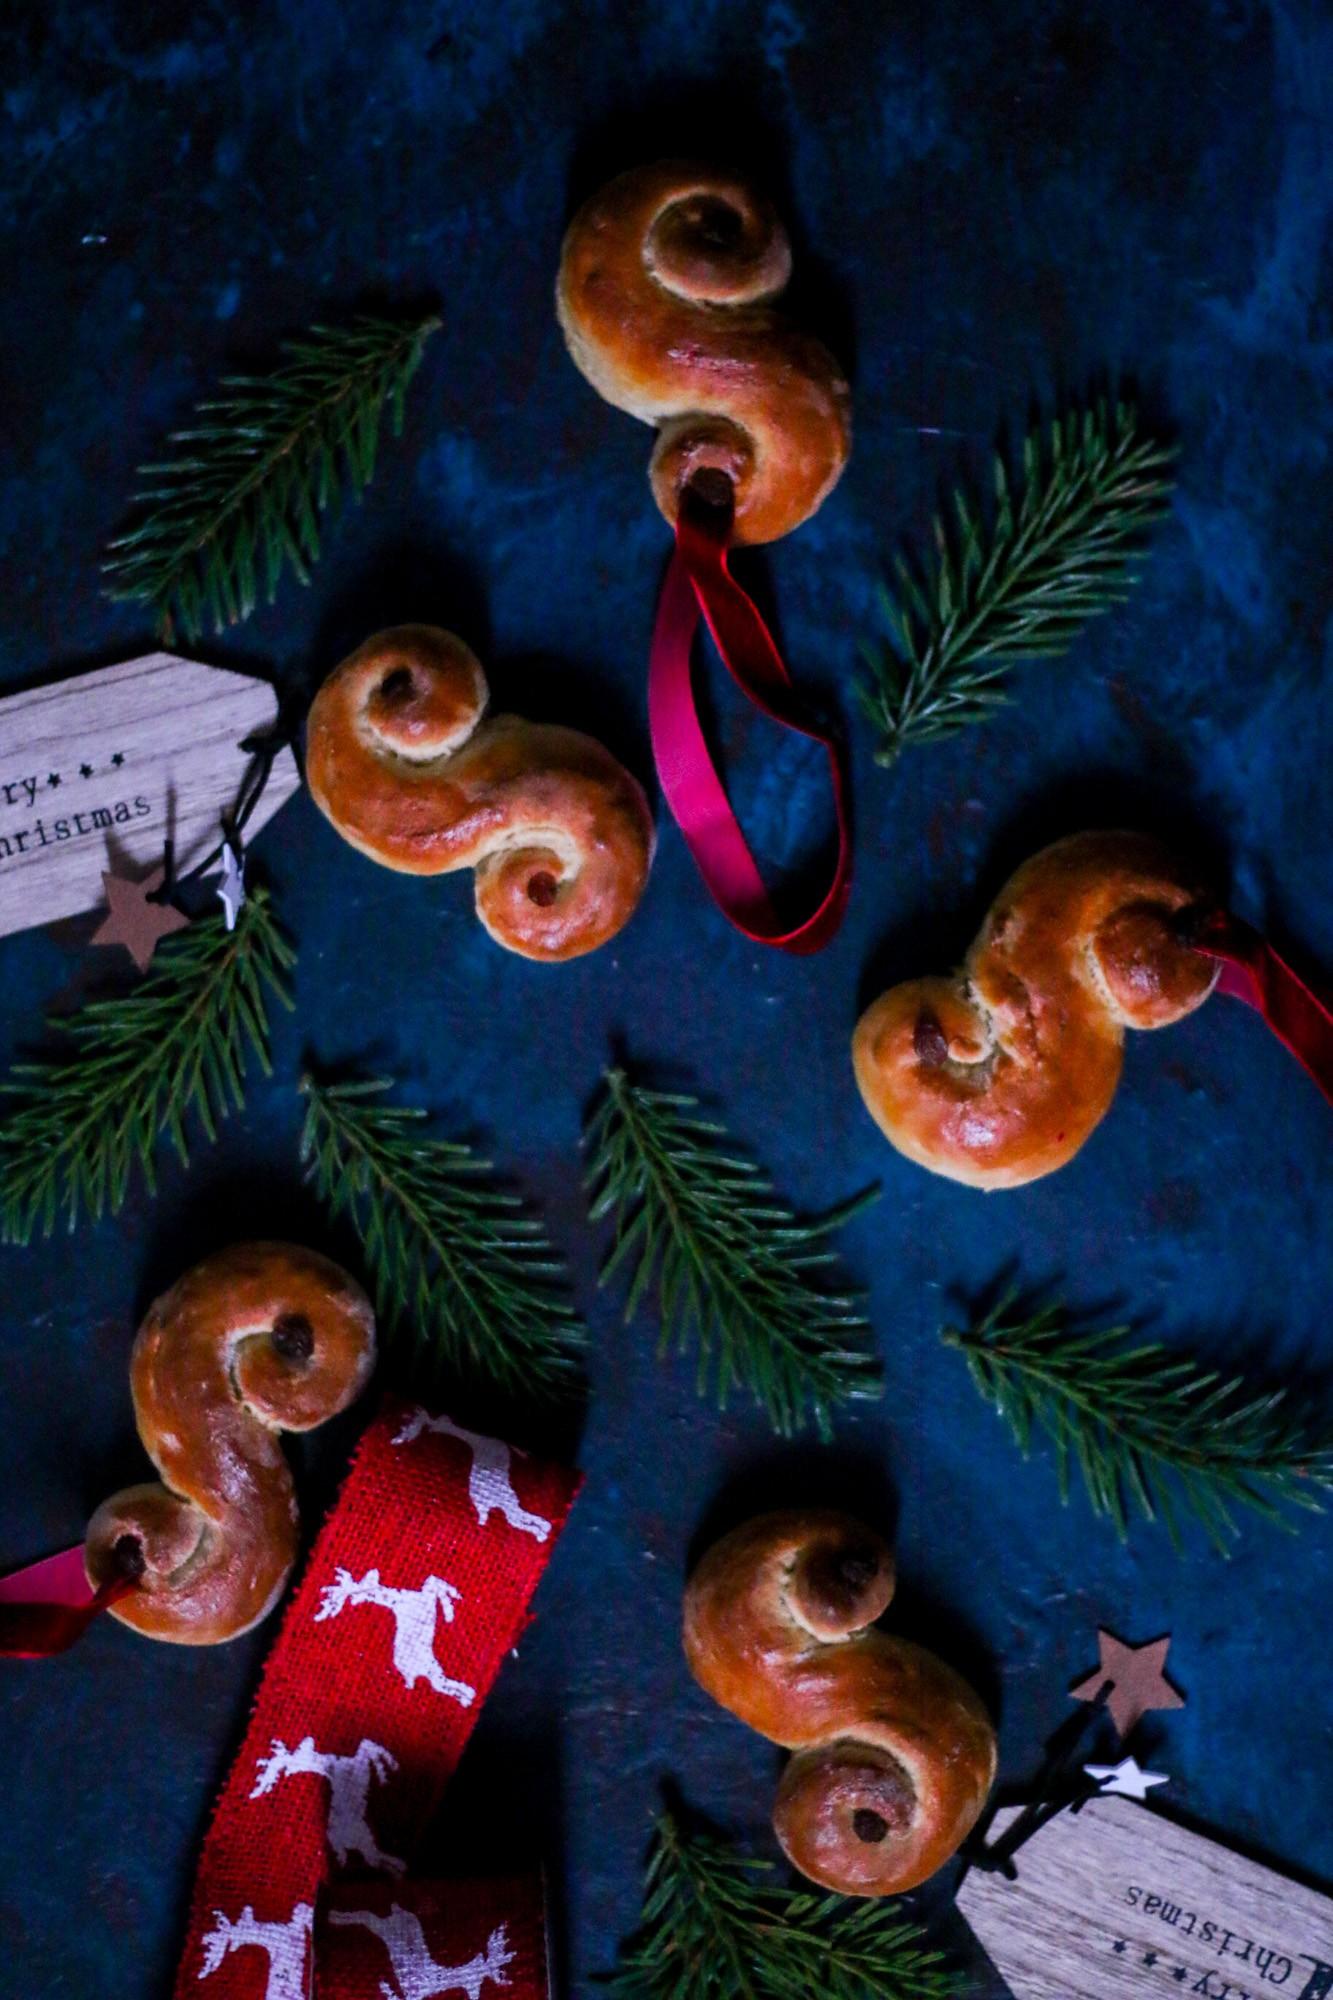 lussekatter-st-lucia-saffron-buns-christmas-cookbook-melissa-ofoedu-photography-for-a-sweet-point-of-view-4-von-1